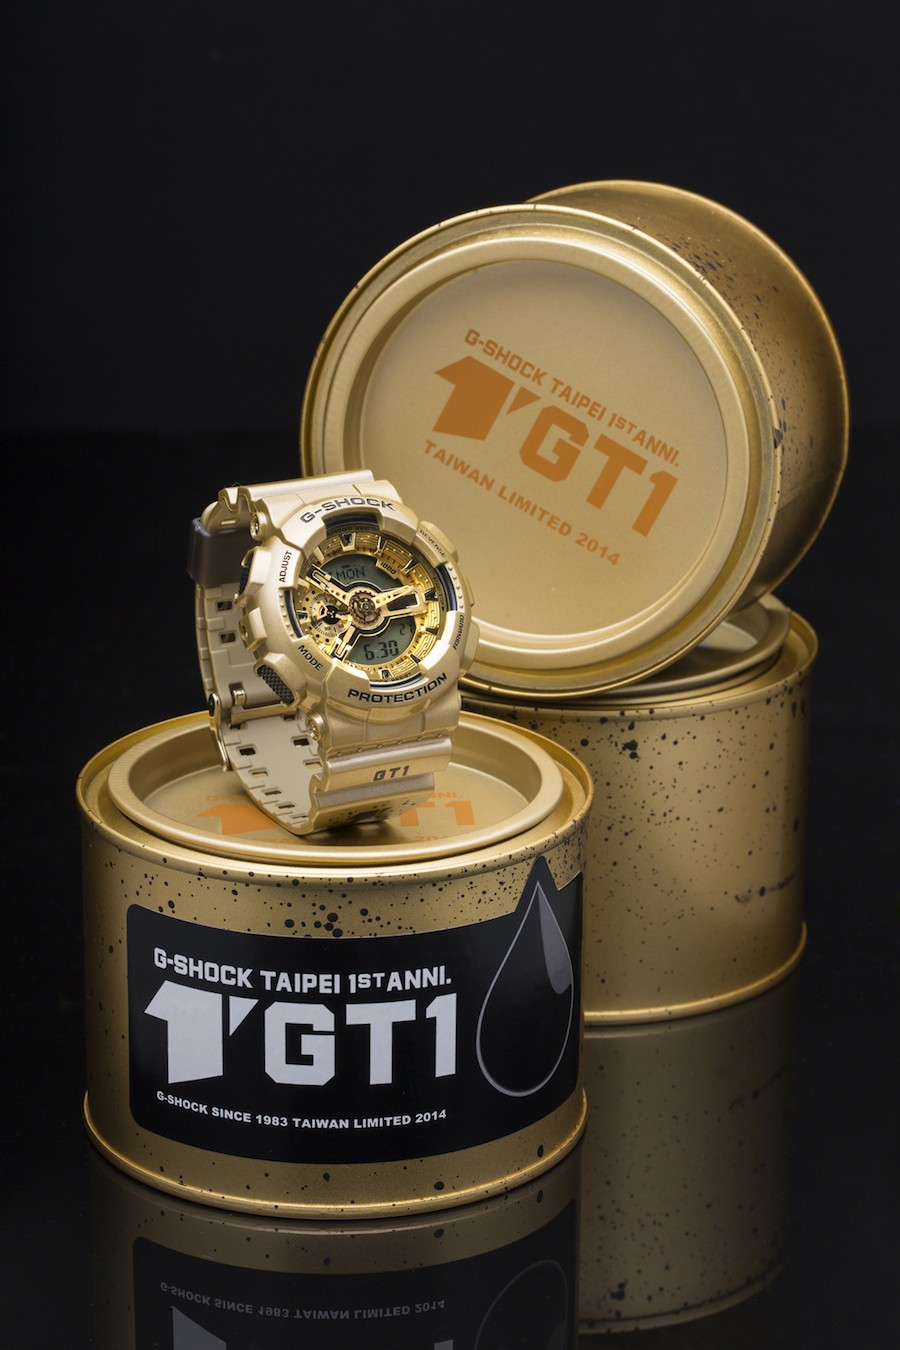 G-SHOCK STORE, TAIPEI一周年限量錶款_特殊包裝組_建議售價NT$6500